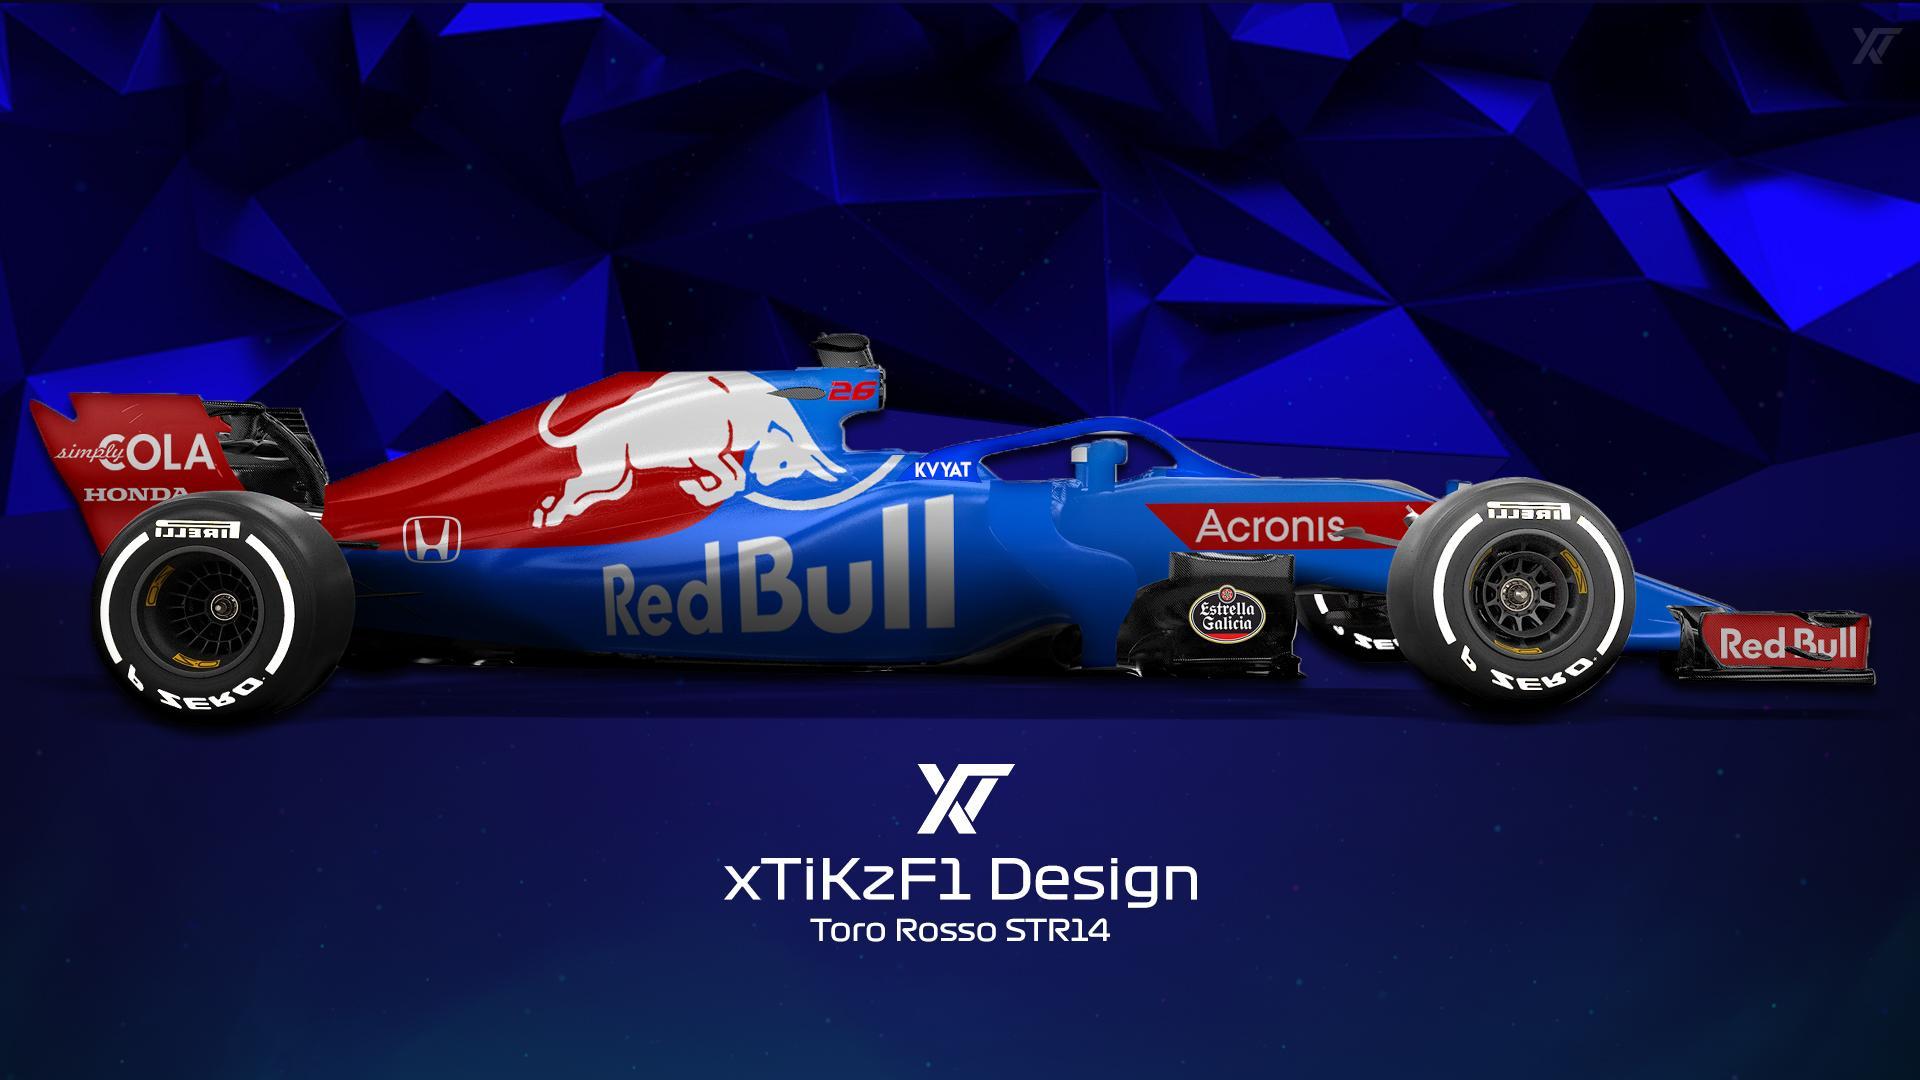 Toro Rosso STR14 Background 8